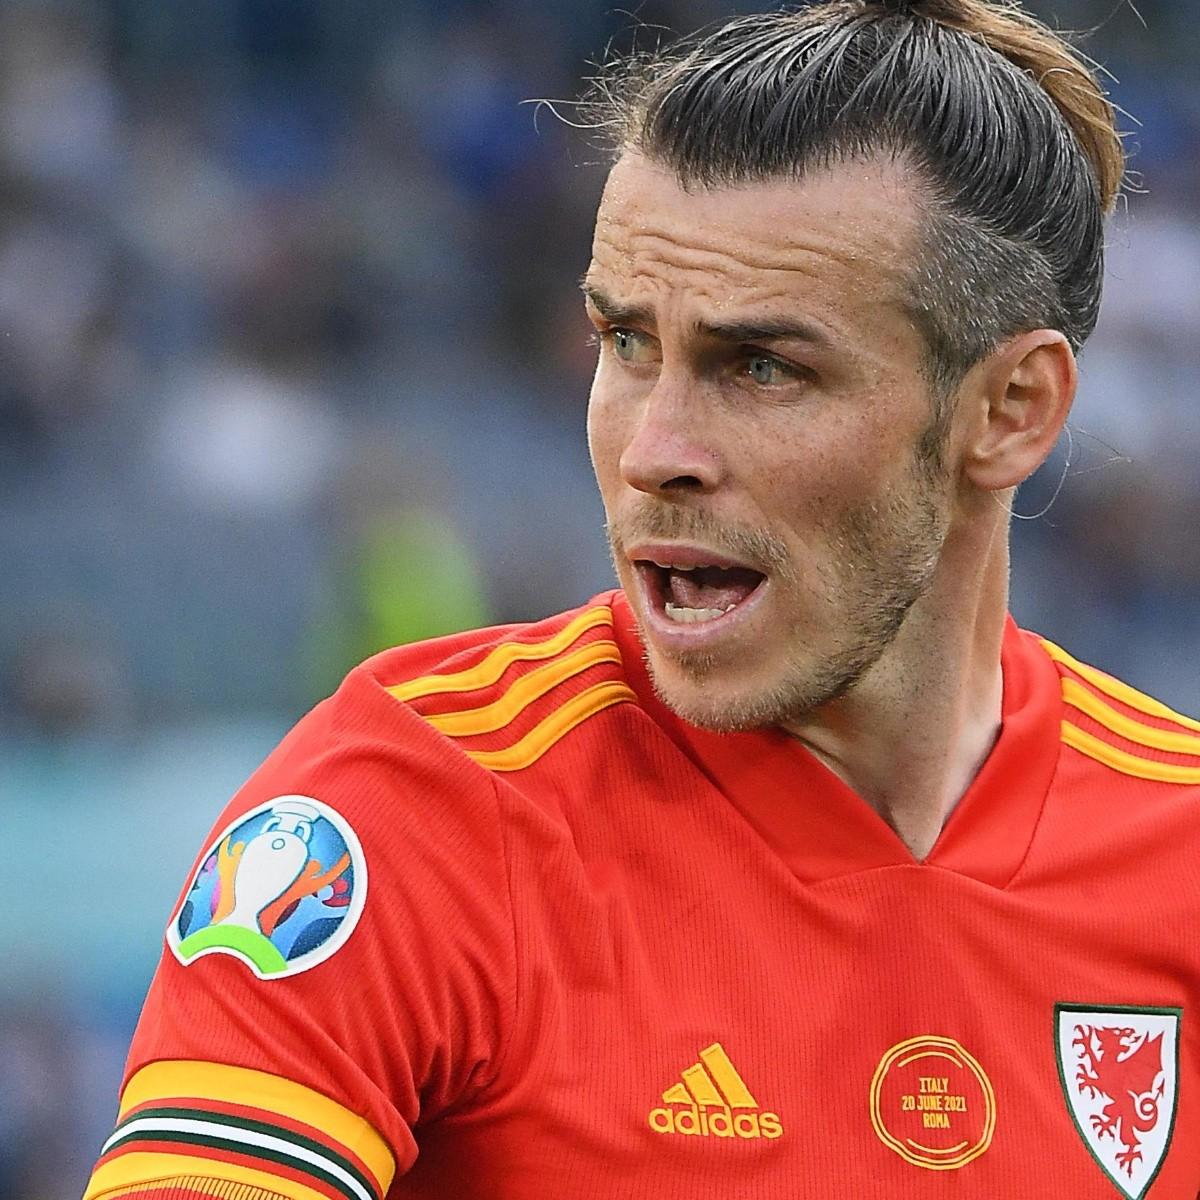 Dove Vedere GALLES DANIMARCA Streaming TV Oggi | Bale vs Damsgaard | Ottavi Euro 2020